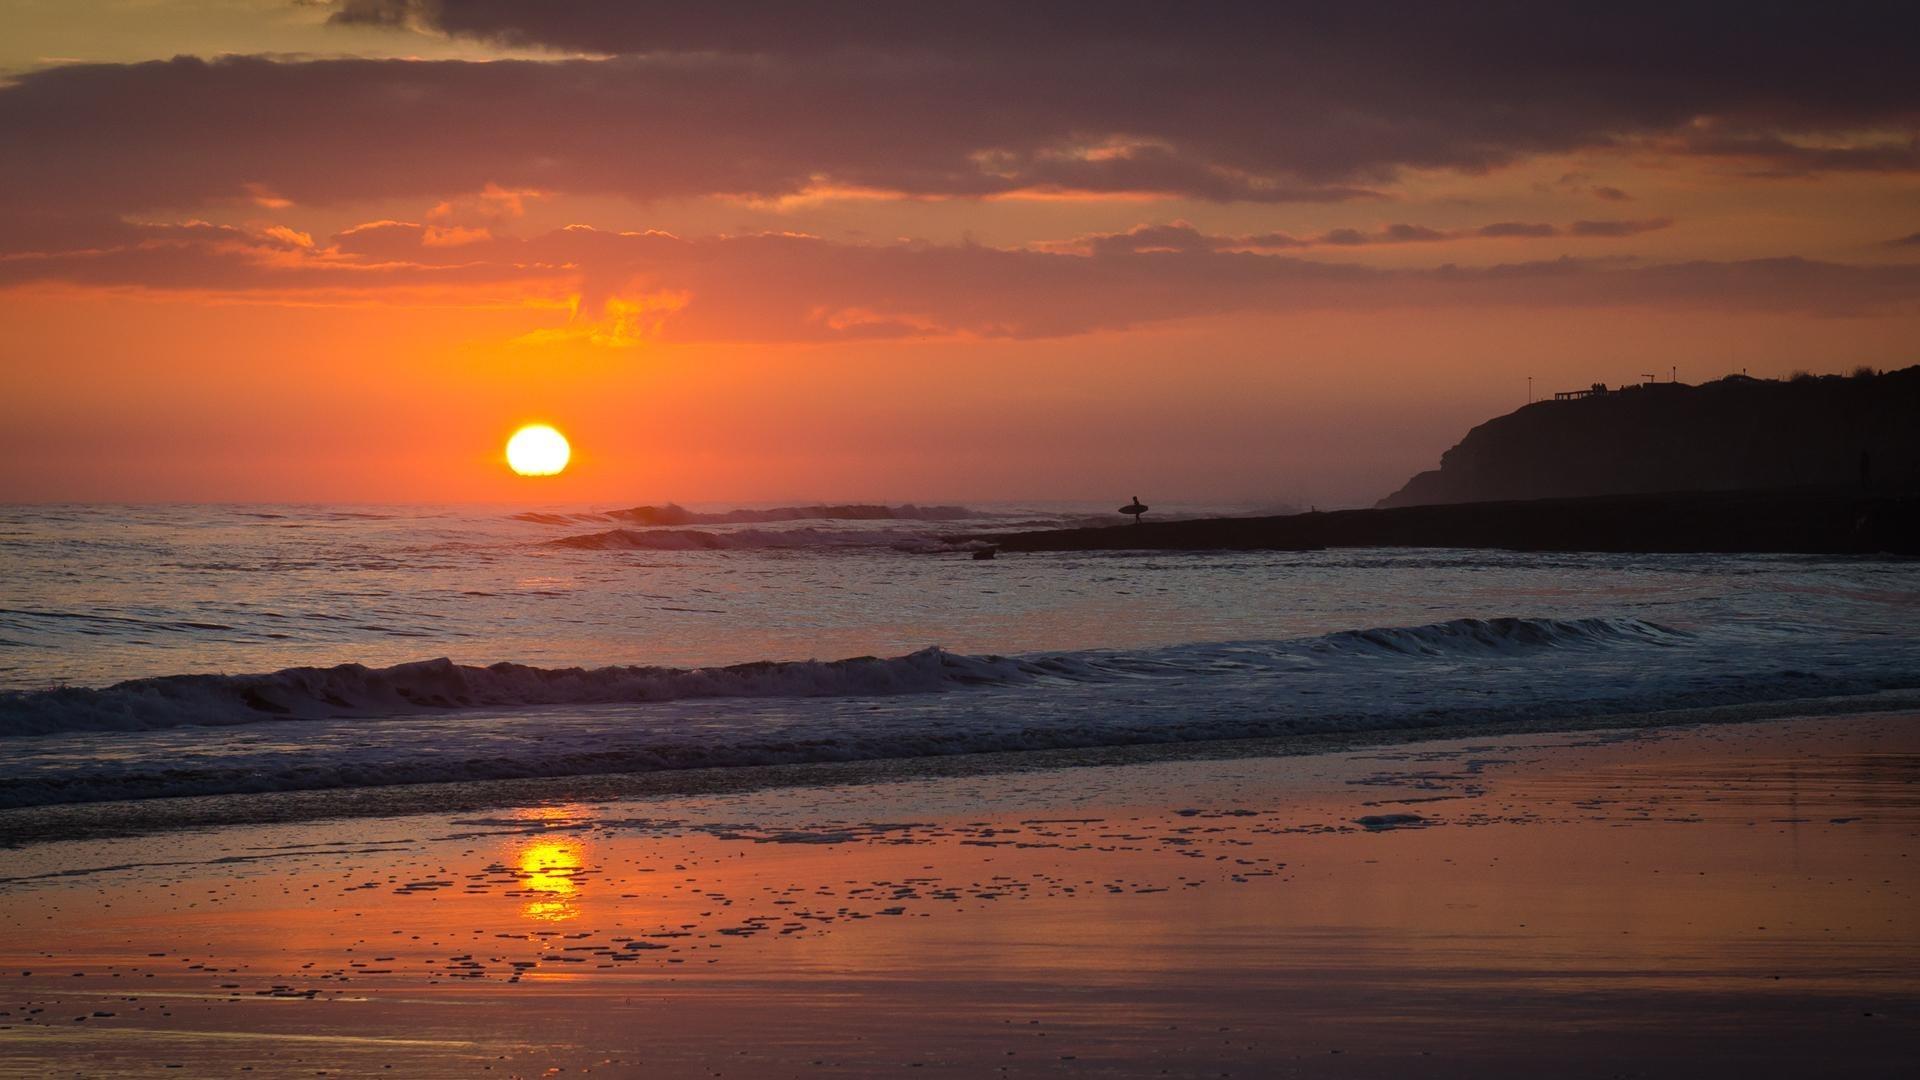 Beautiful Sunset Scenery Drawing Hd Wallpaper Luz Do Sol